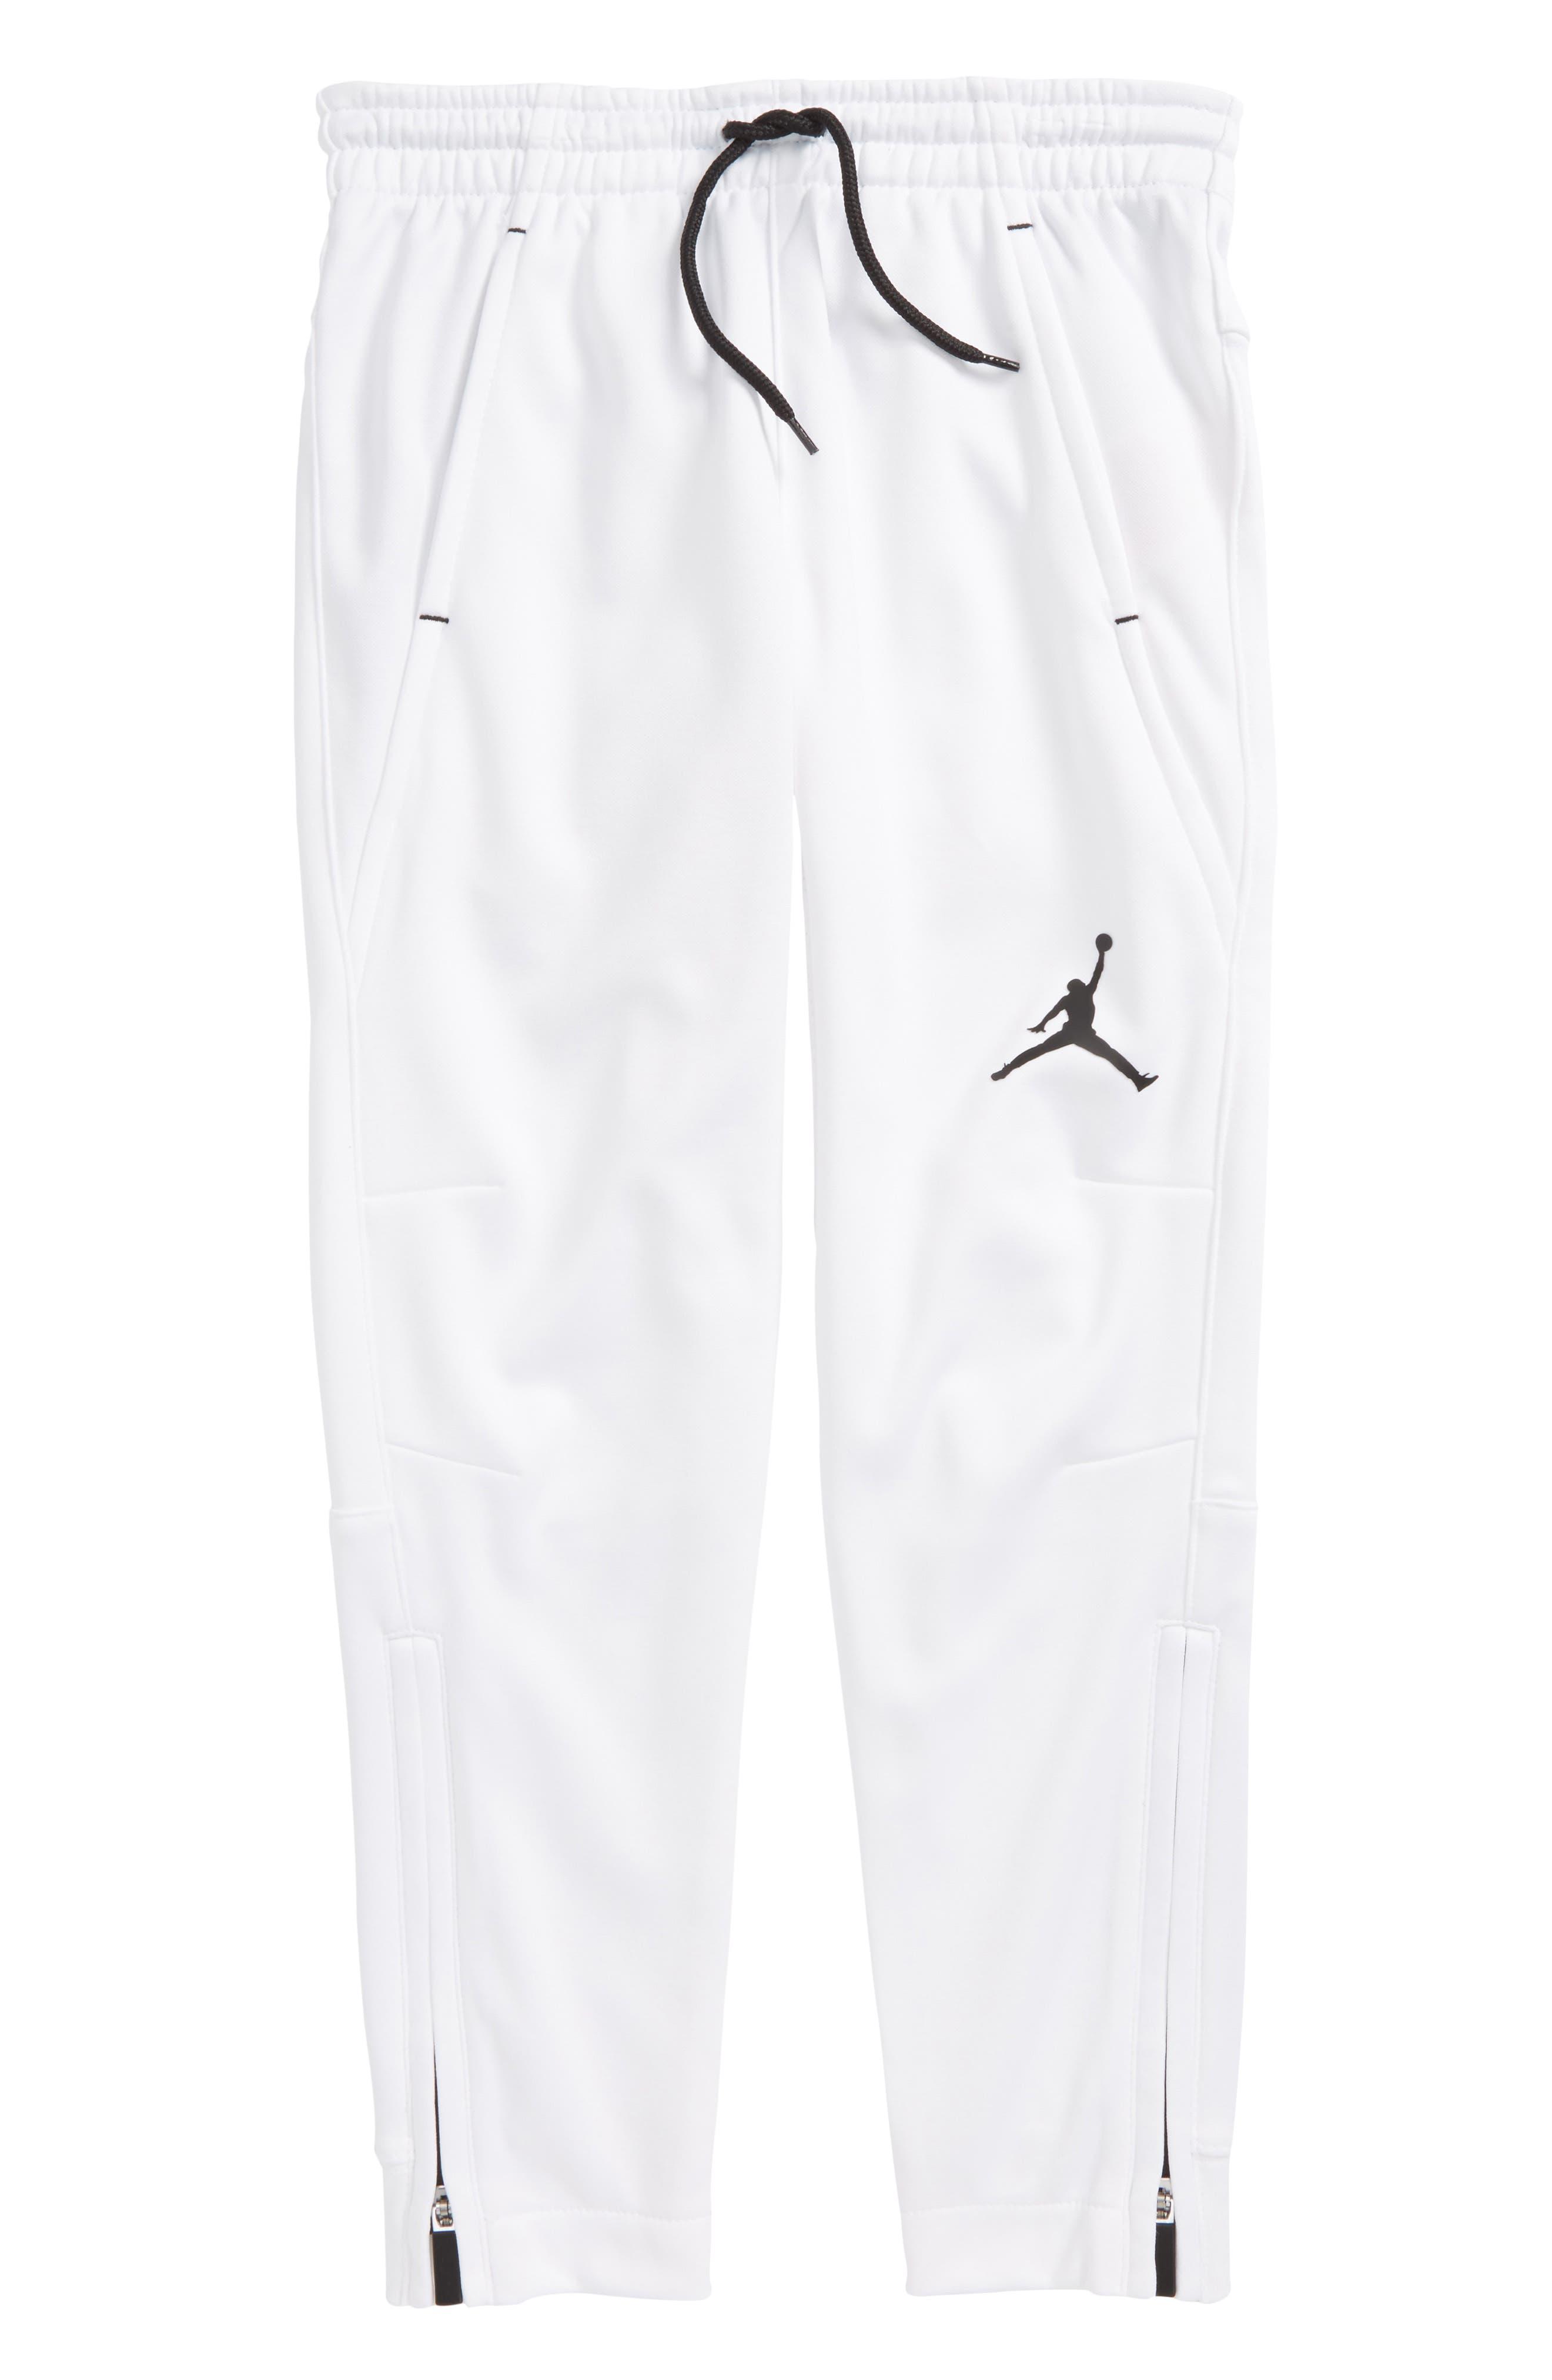 Jordan Dry 23 Alpha FZ Therma-FIT Sweatpants,                             Main thumbnail 1, color,                             White